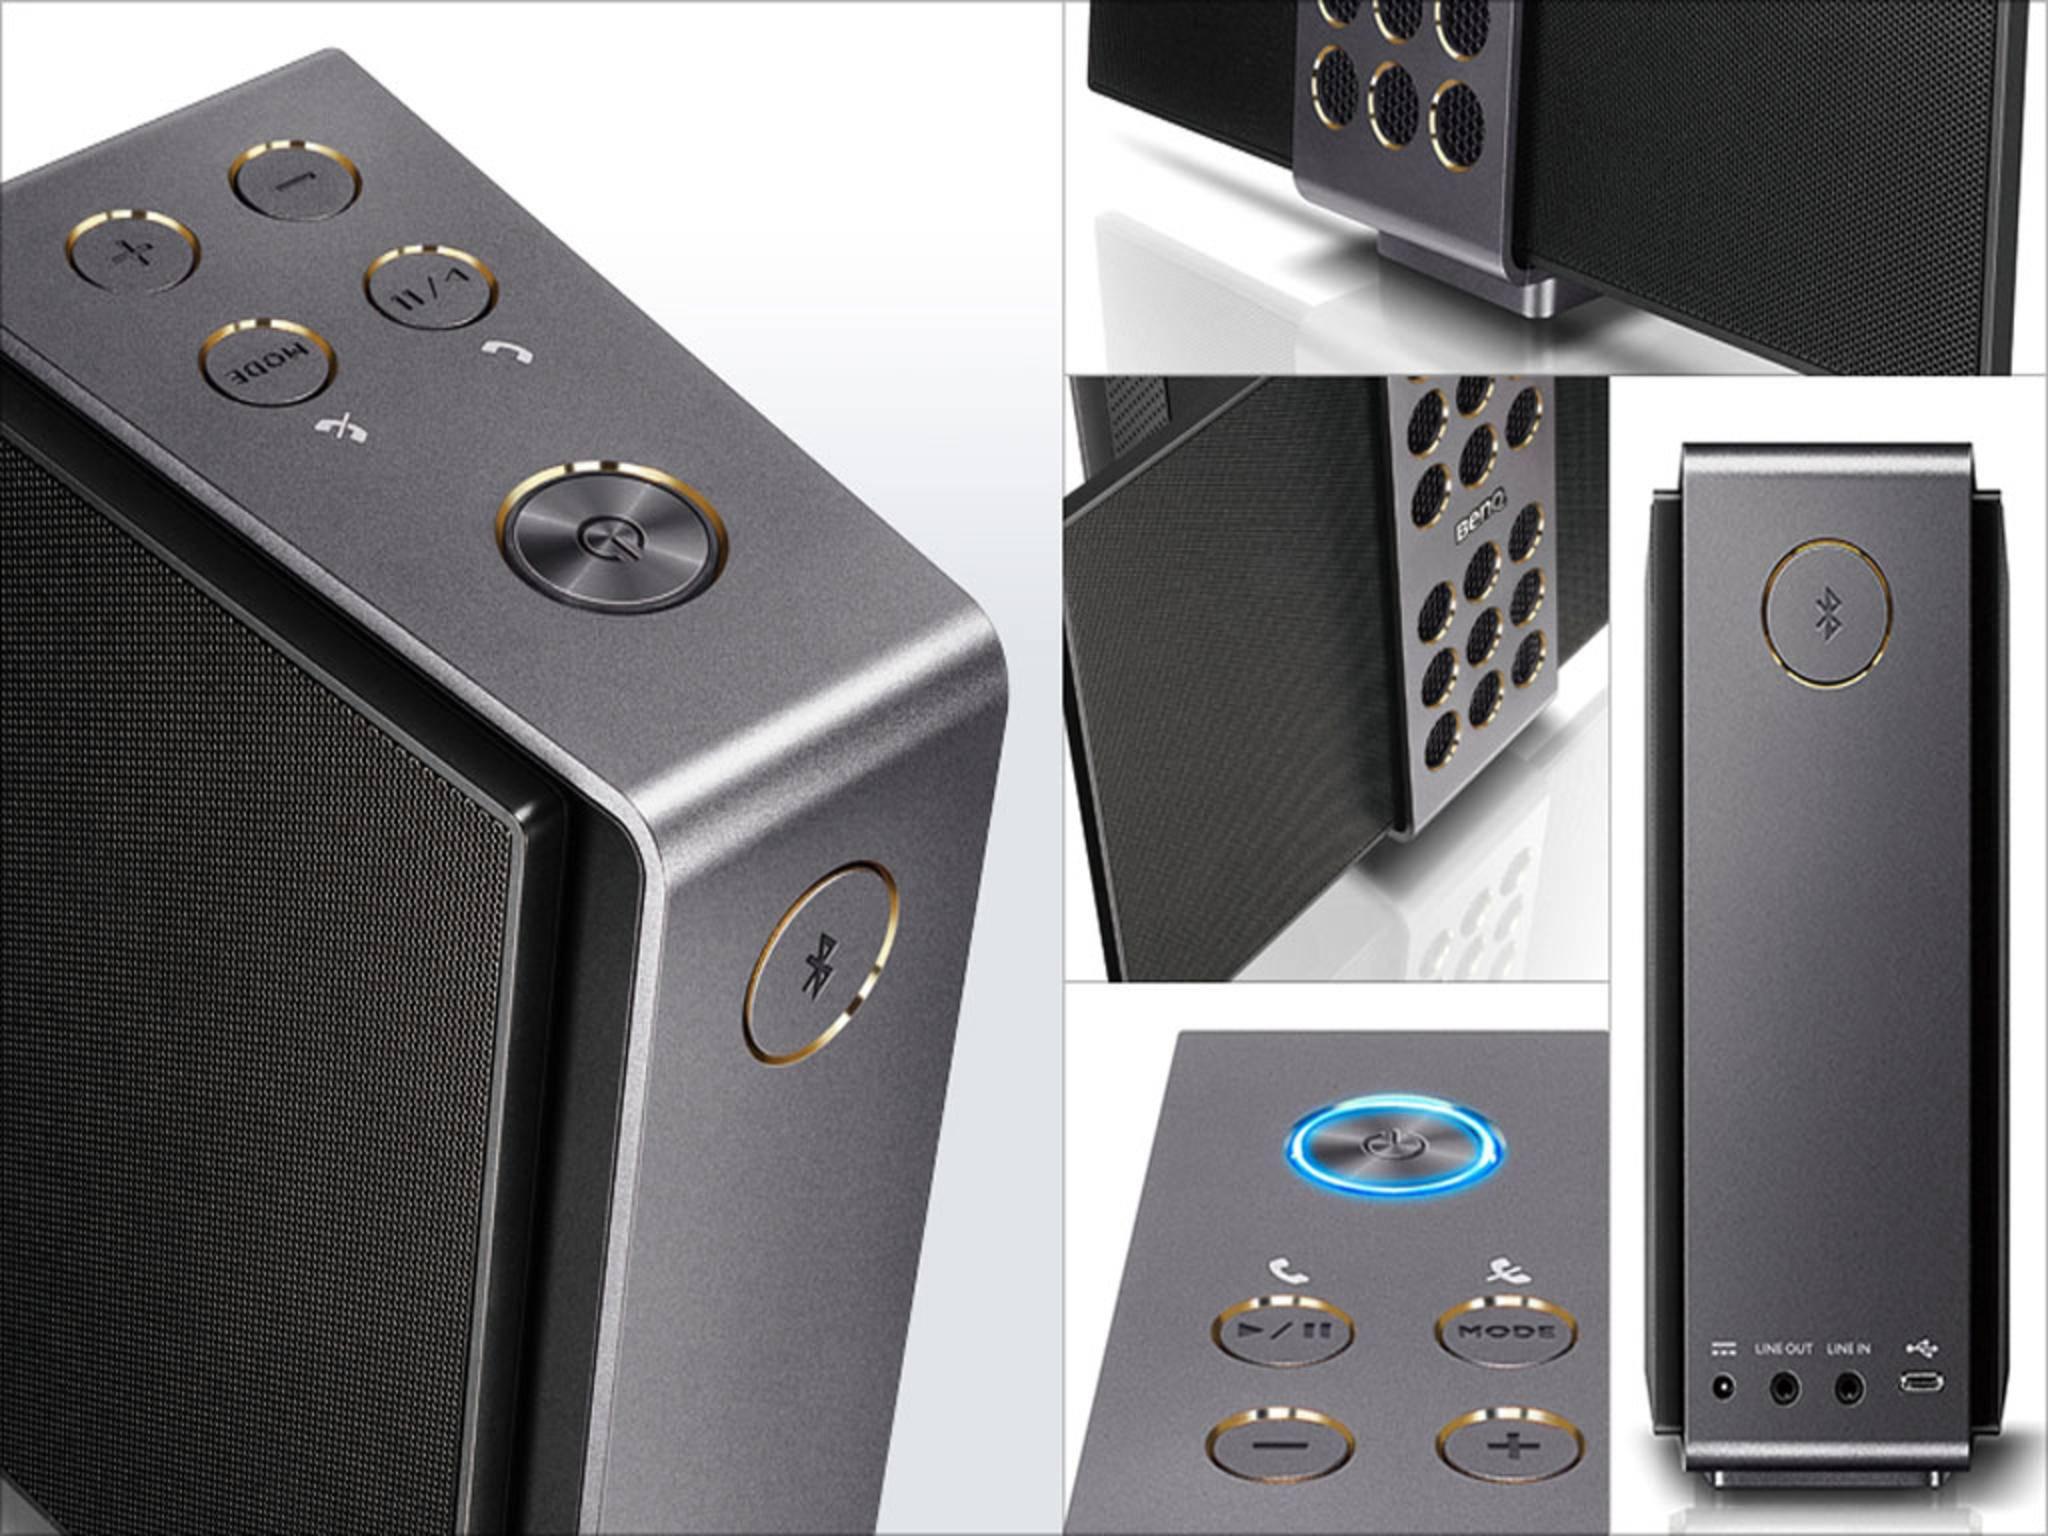 Der BenQ treVolo-Lautsprecher gilt als absolutes Bluetooth-Klangwunder.